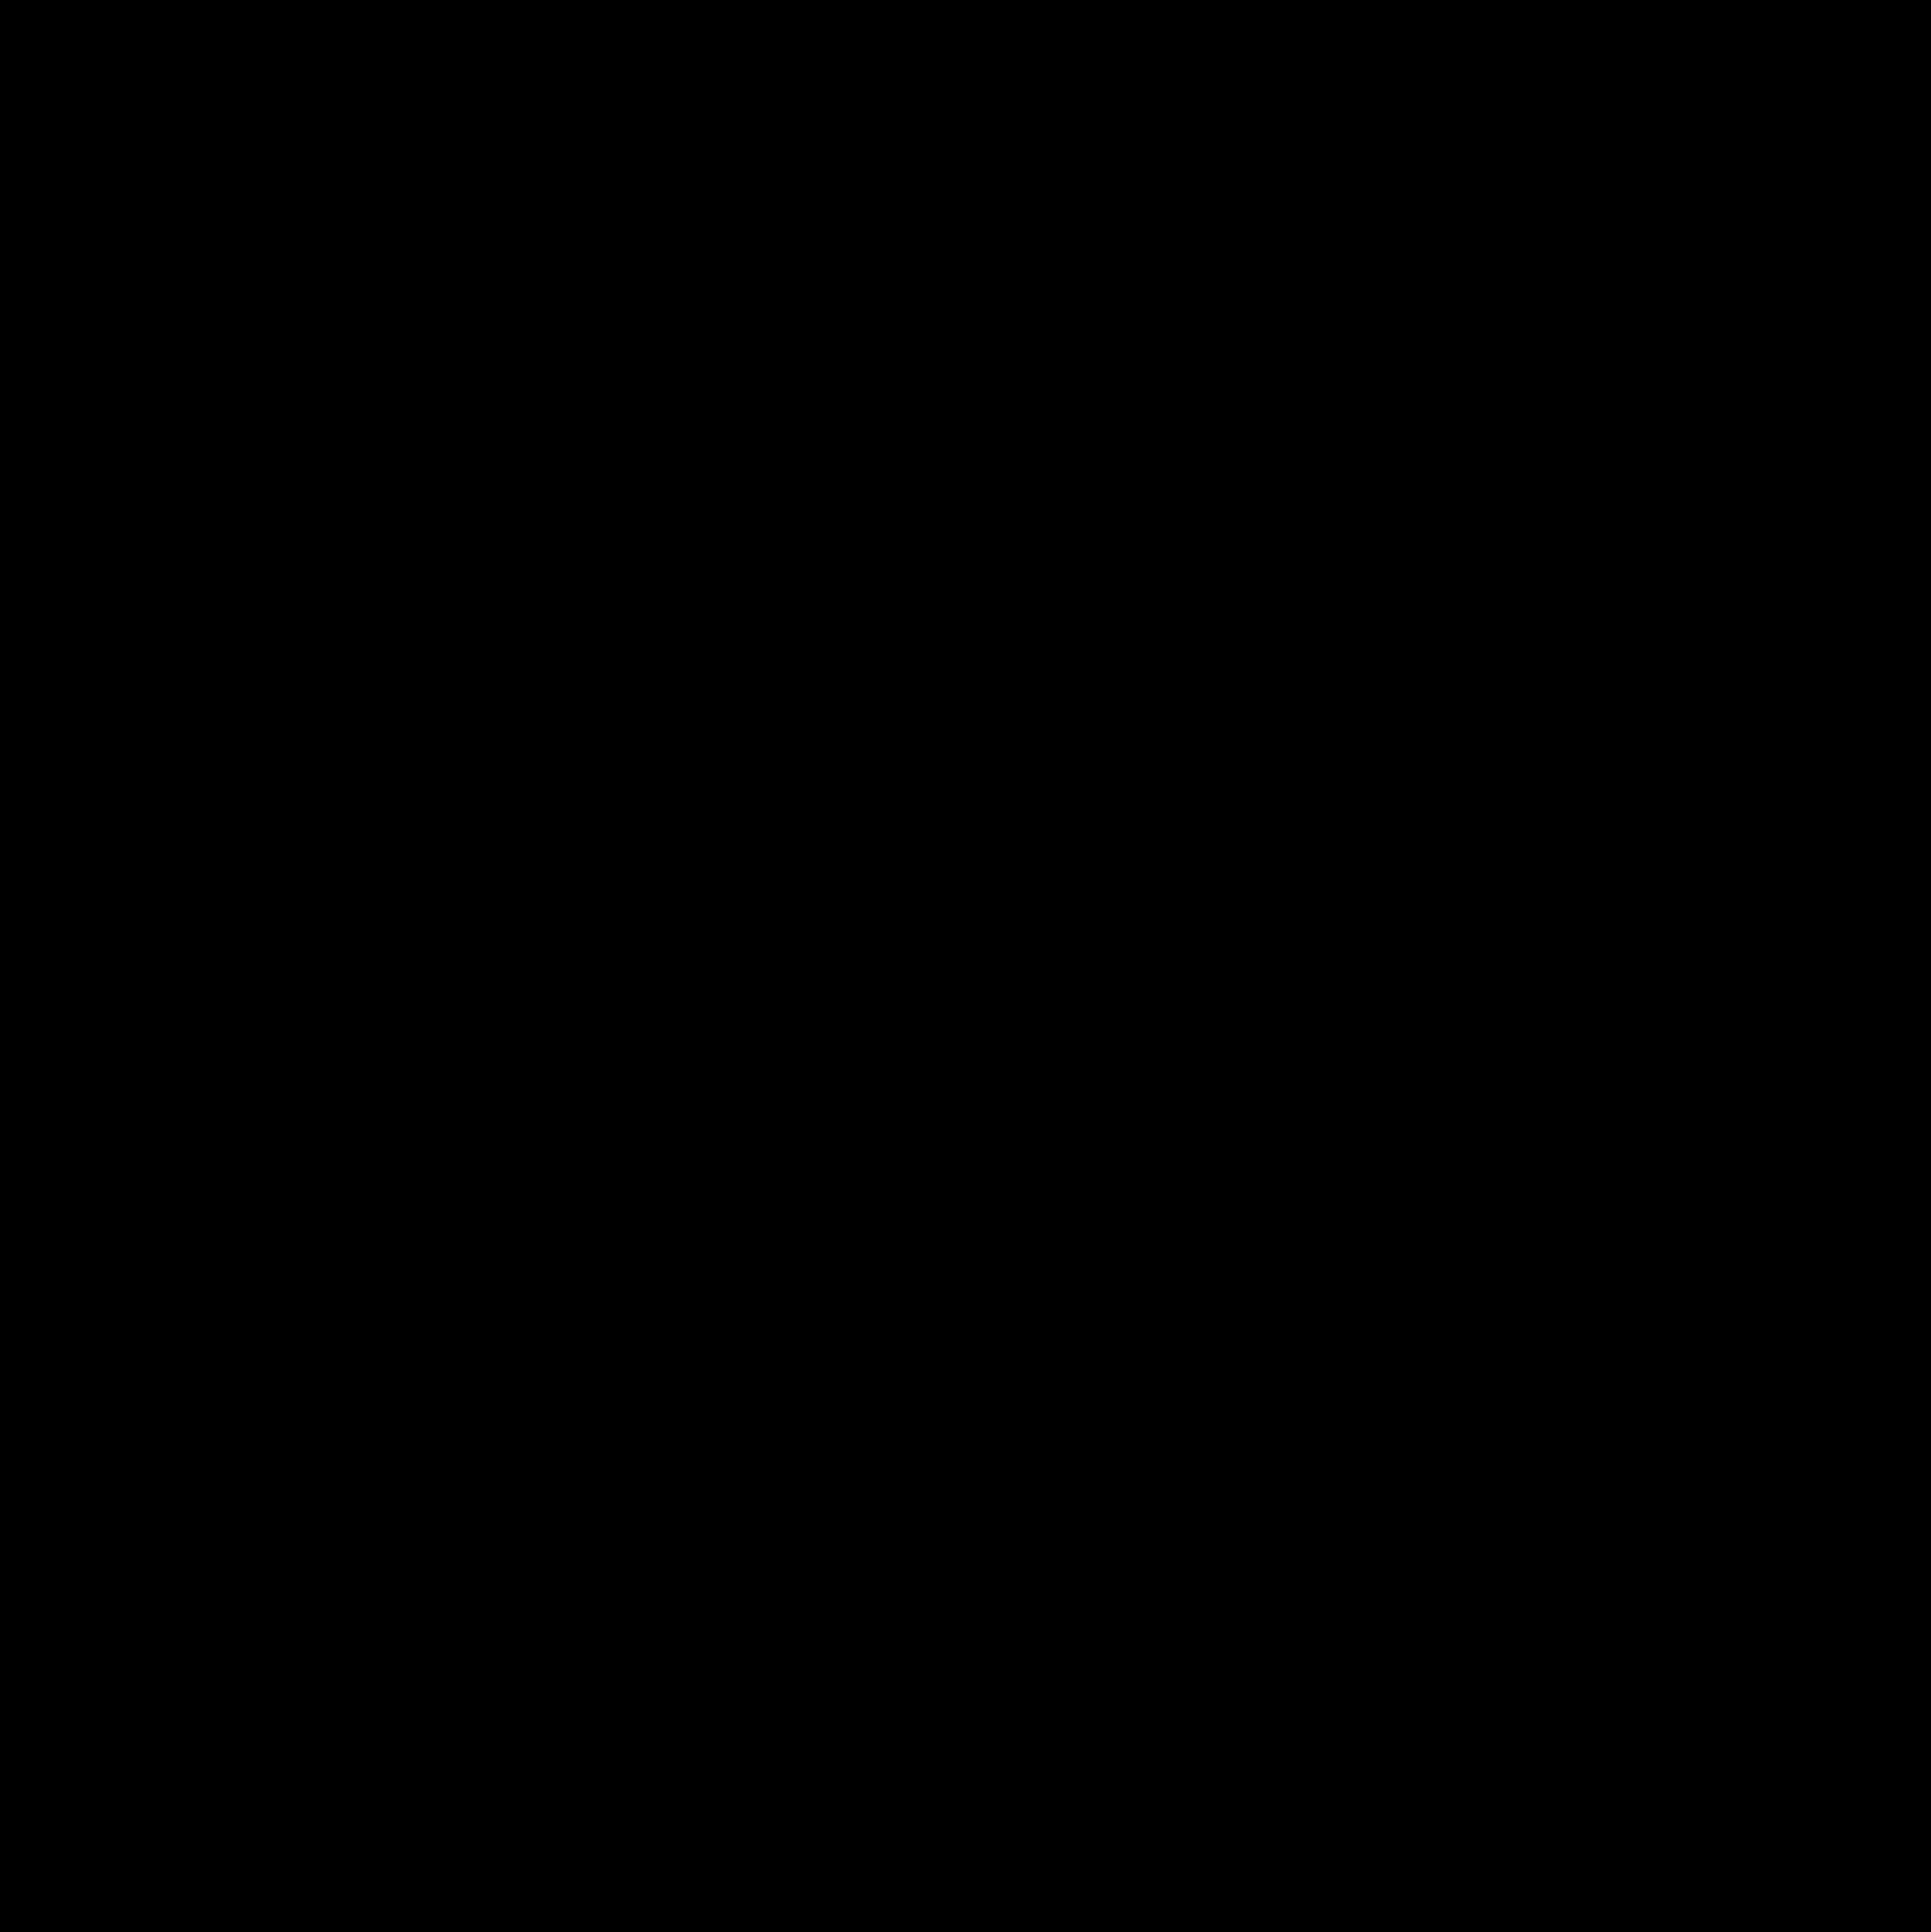 Clipart - Square frame 7